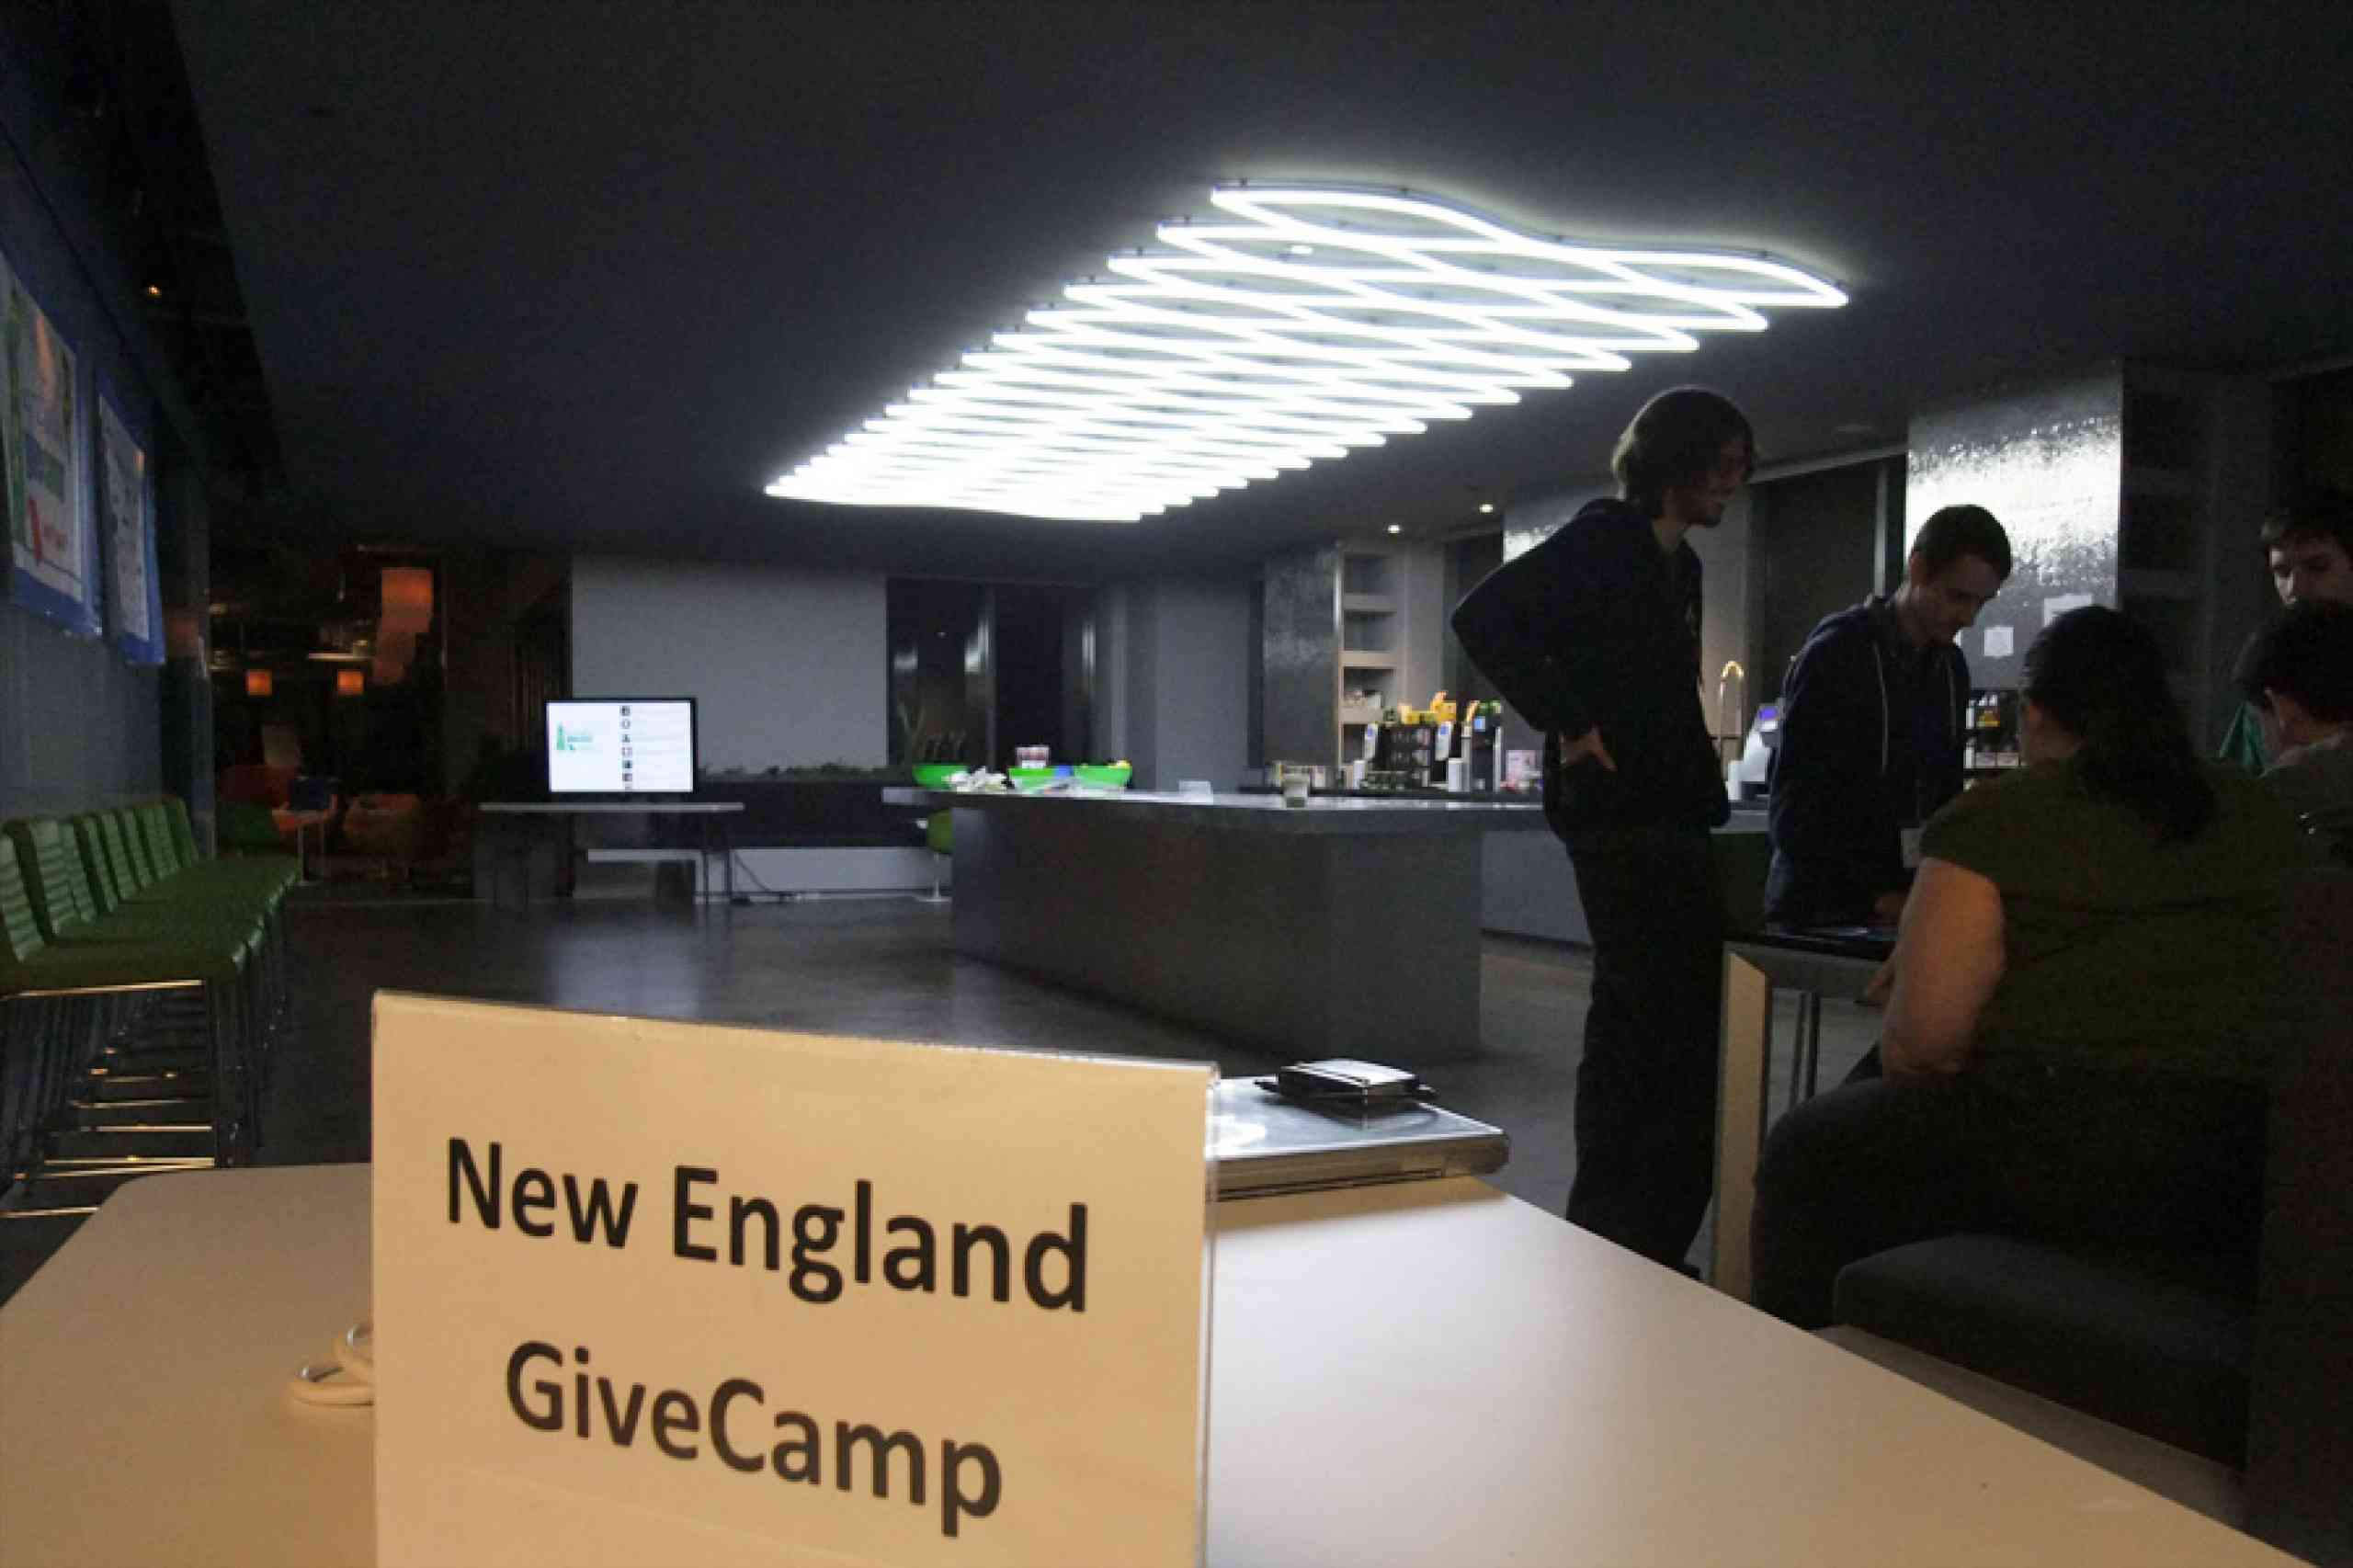 NewEnglandGiveCamp2012